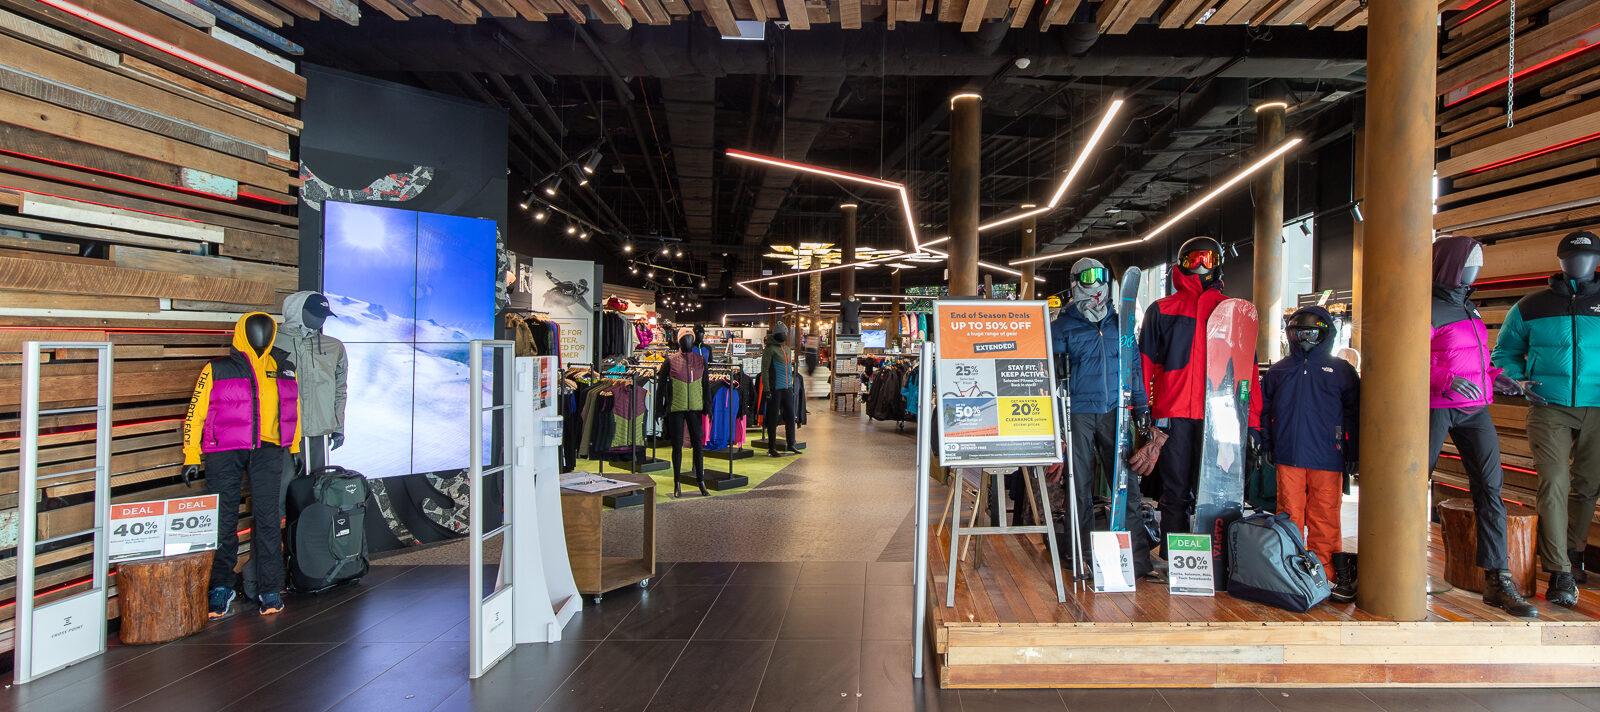 New storefront for Torpedo 7